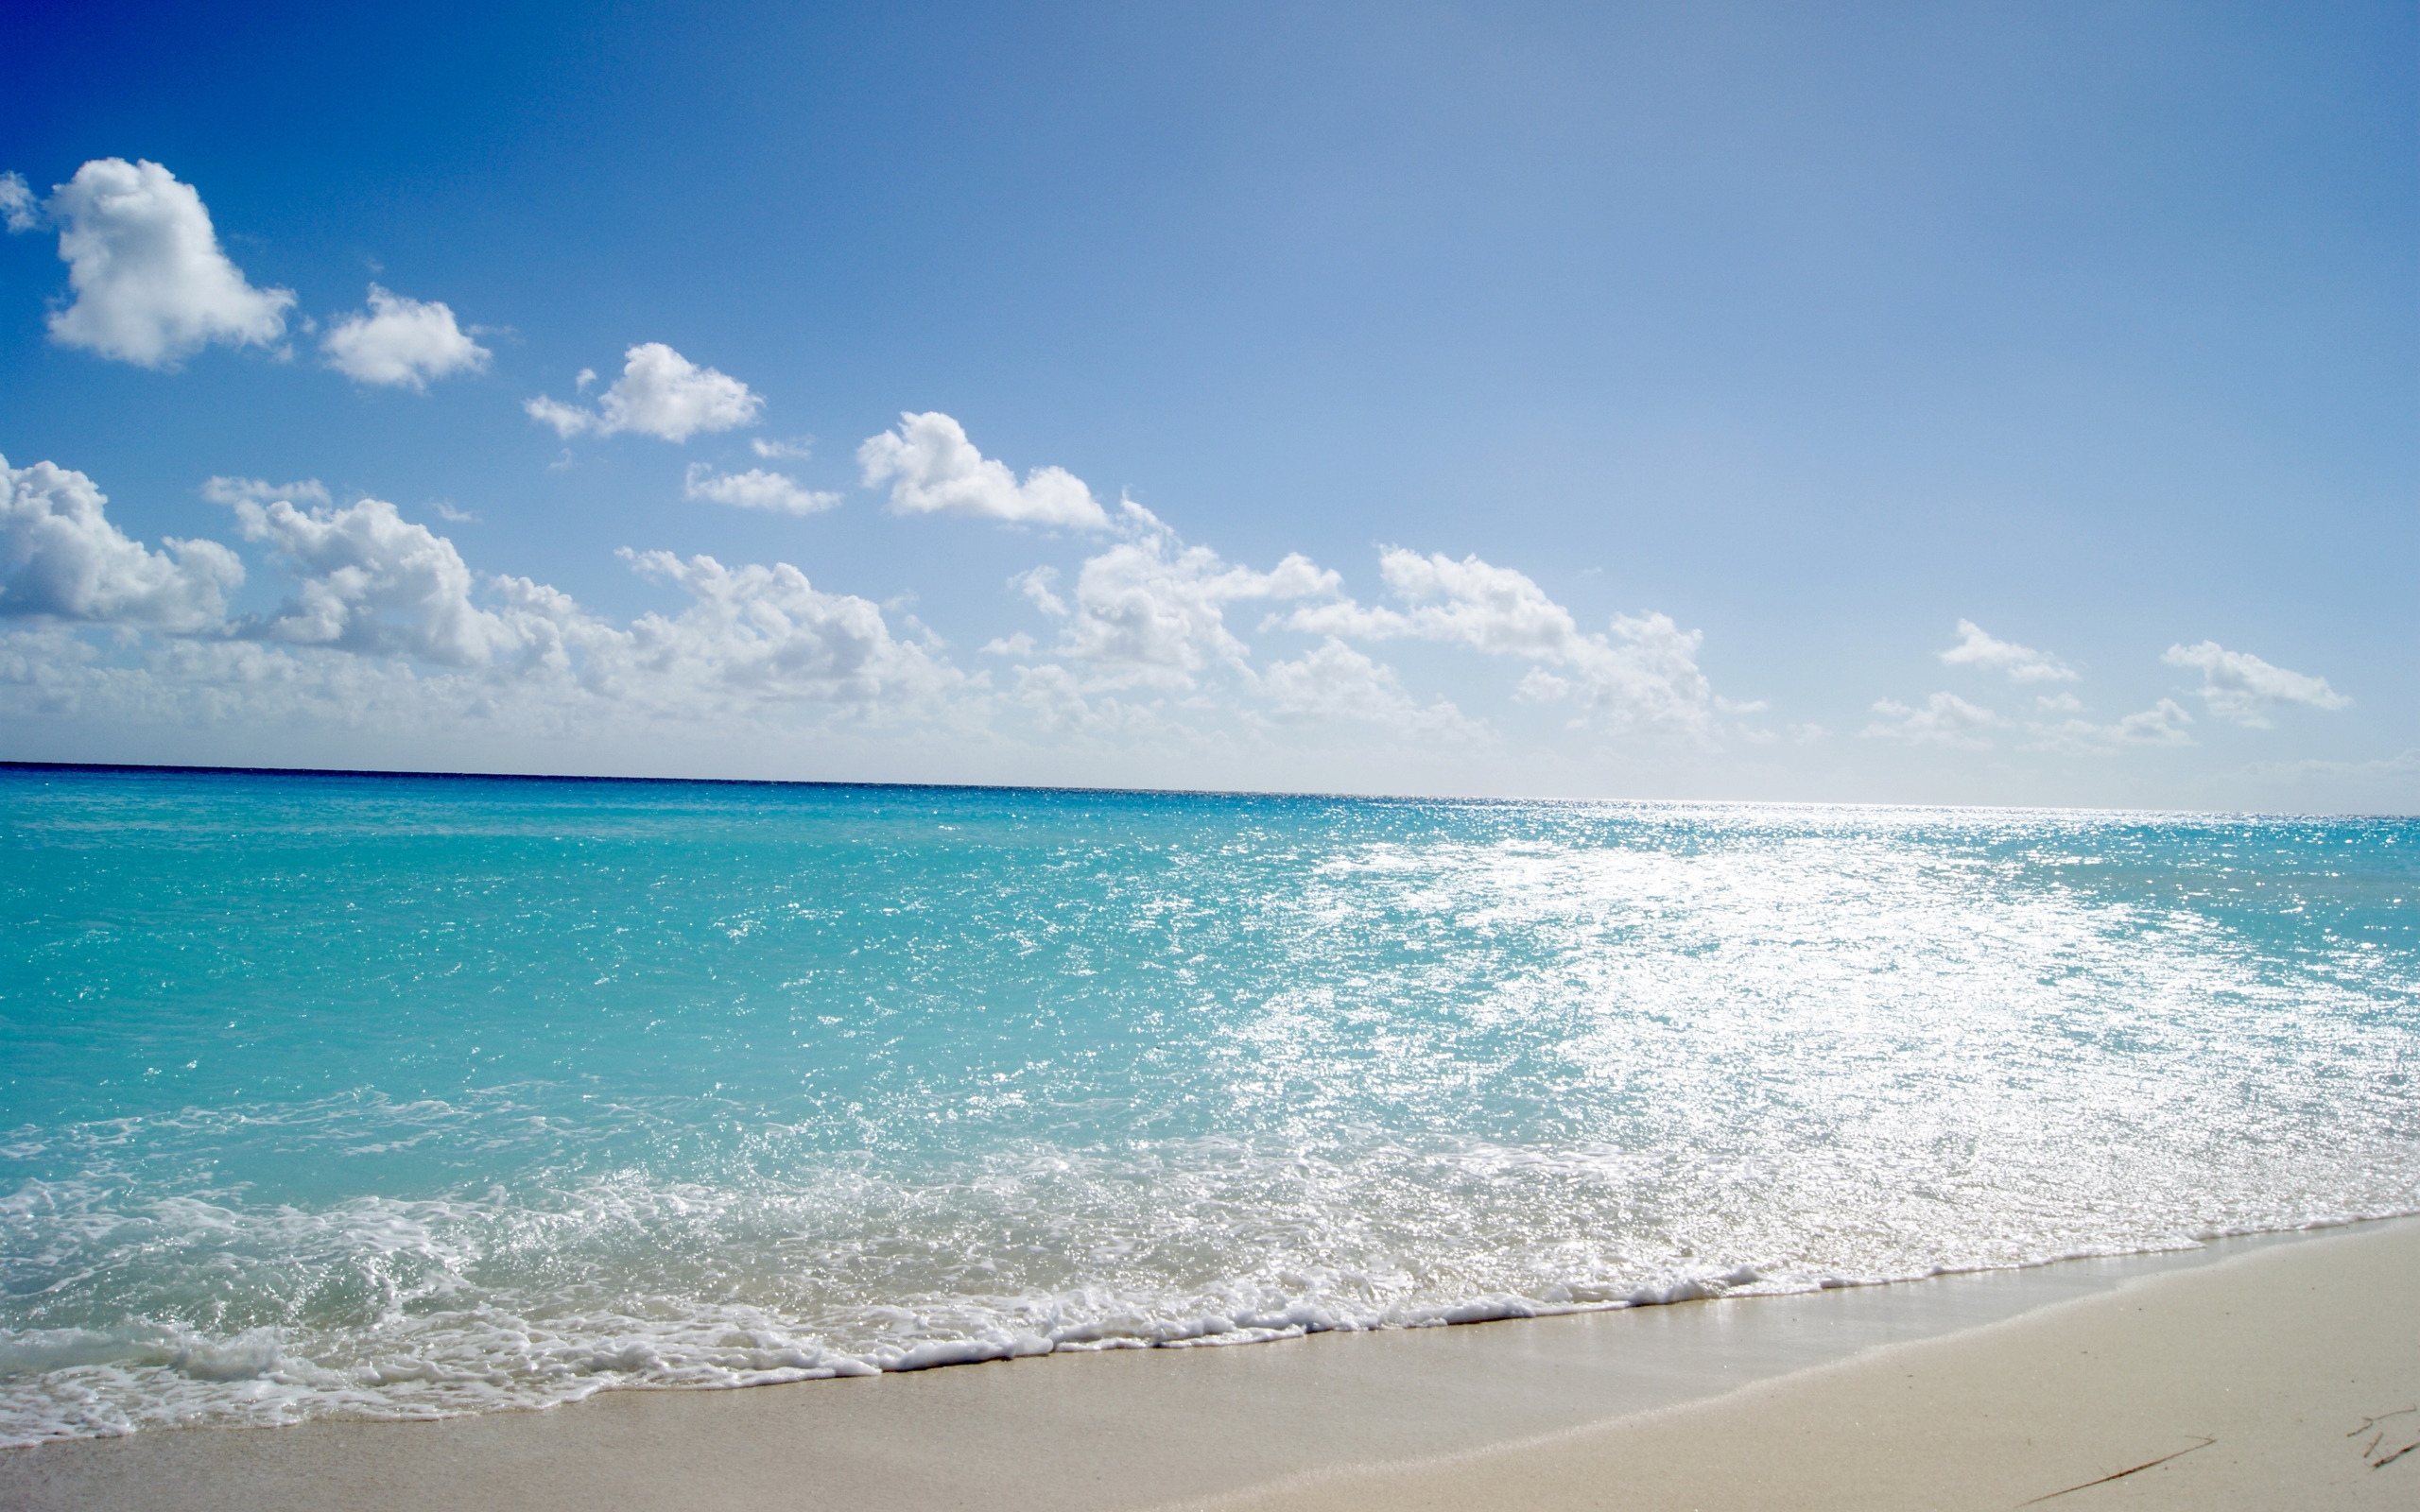 Summer at the sea / 2560 x 1600 / Water / Photography | MIRIADNA.COM